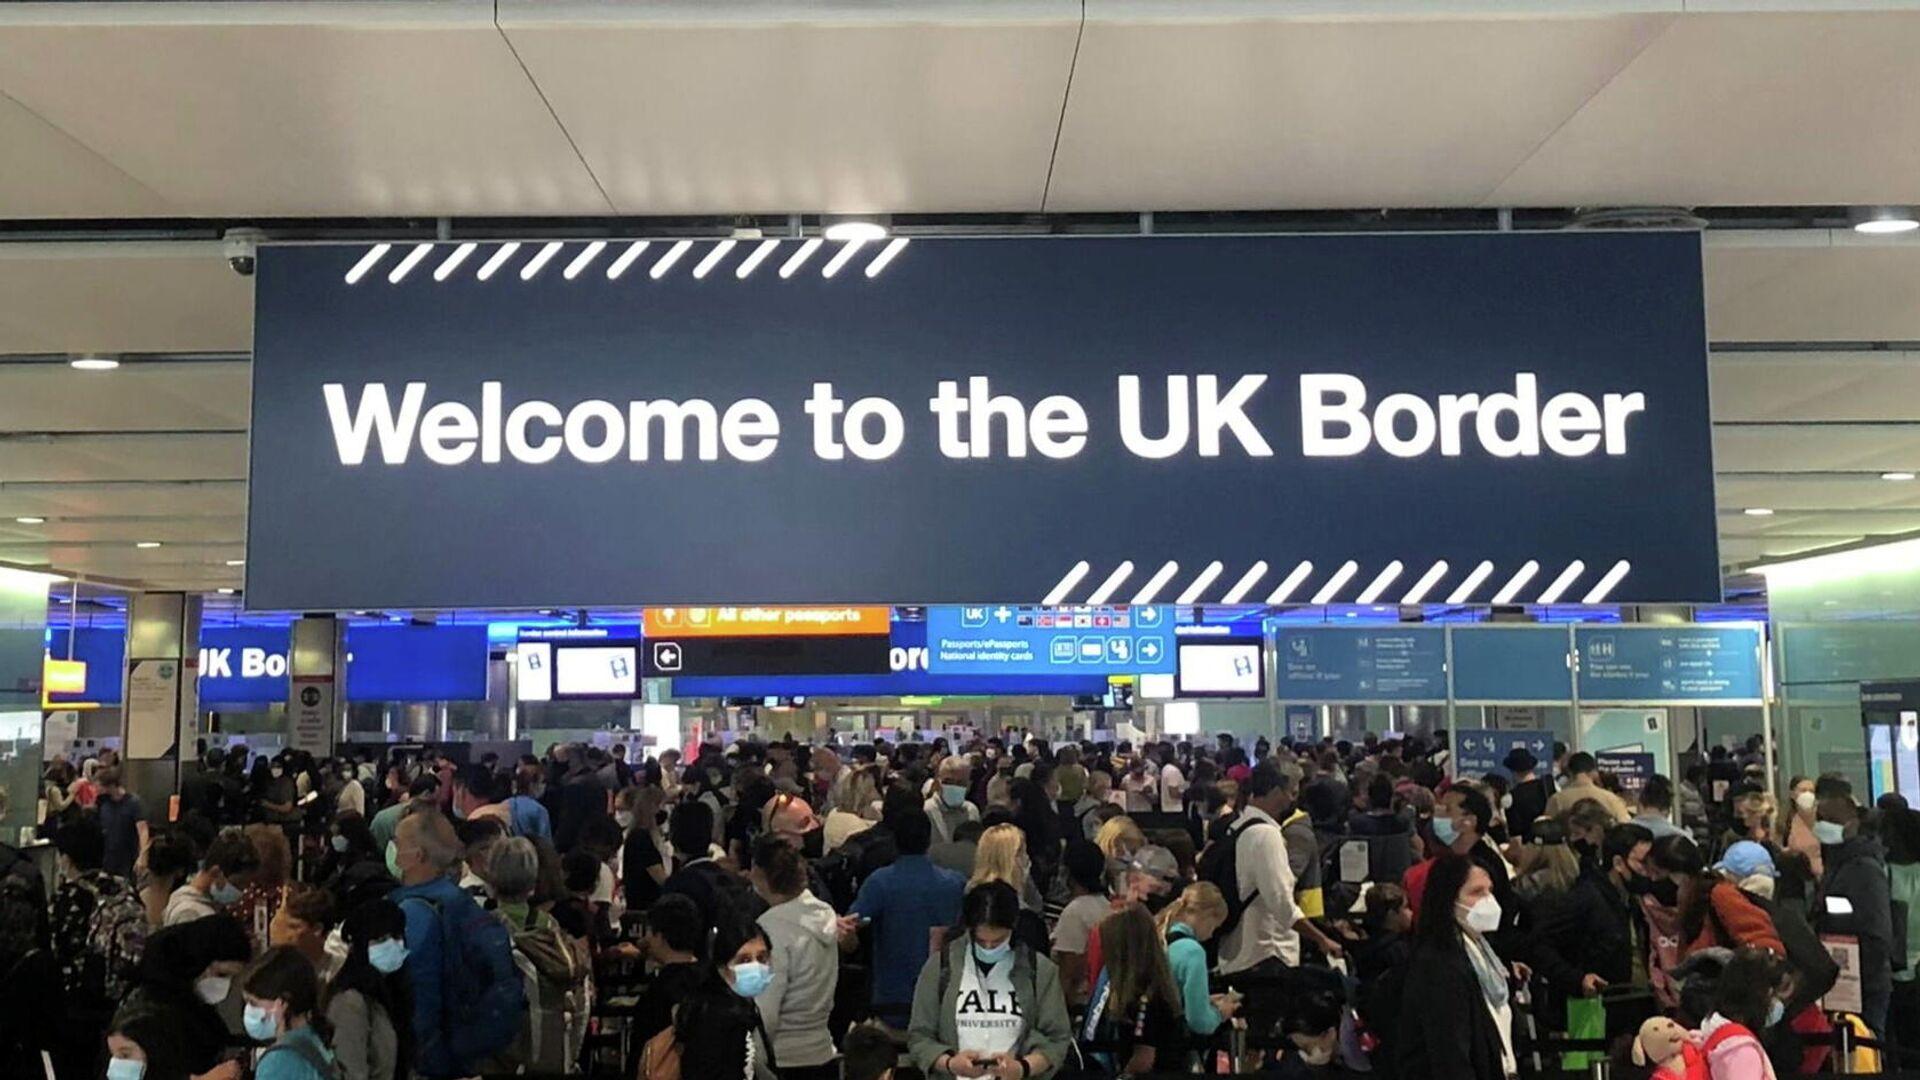 Queues of people wait in line at U.K. citizens arrivals at Heathrow Airport in London, Britain, September 1, 2021. - Sputnik International, 1920, 24.09.2021